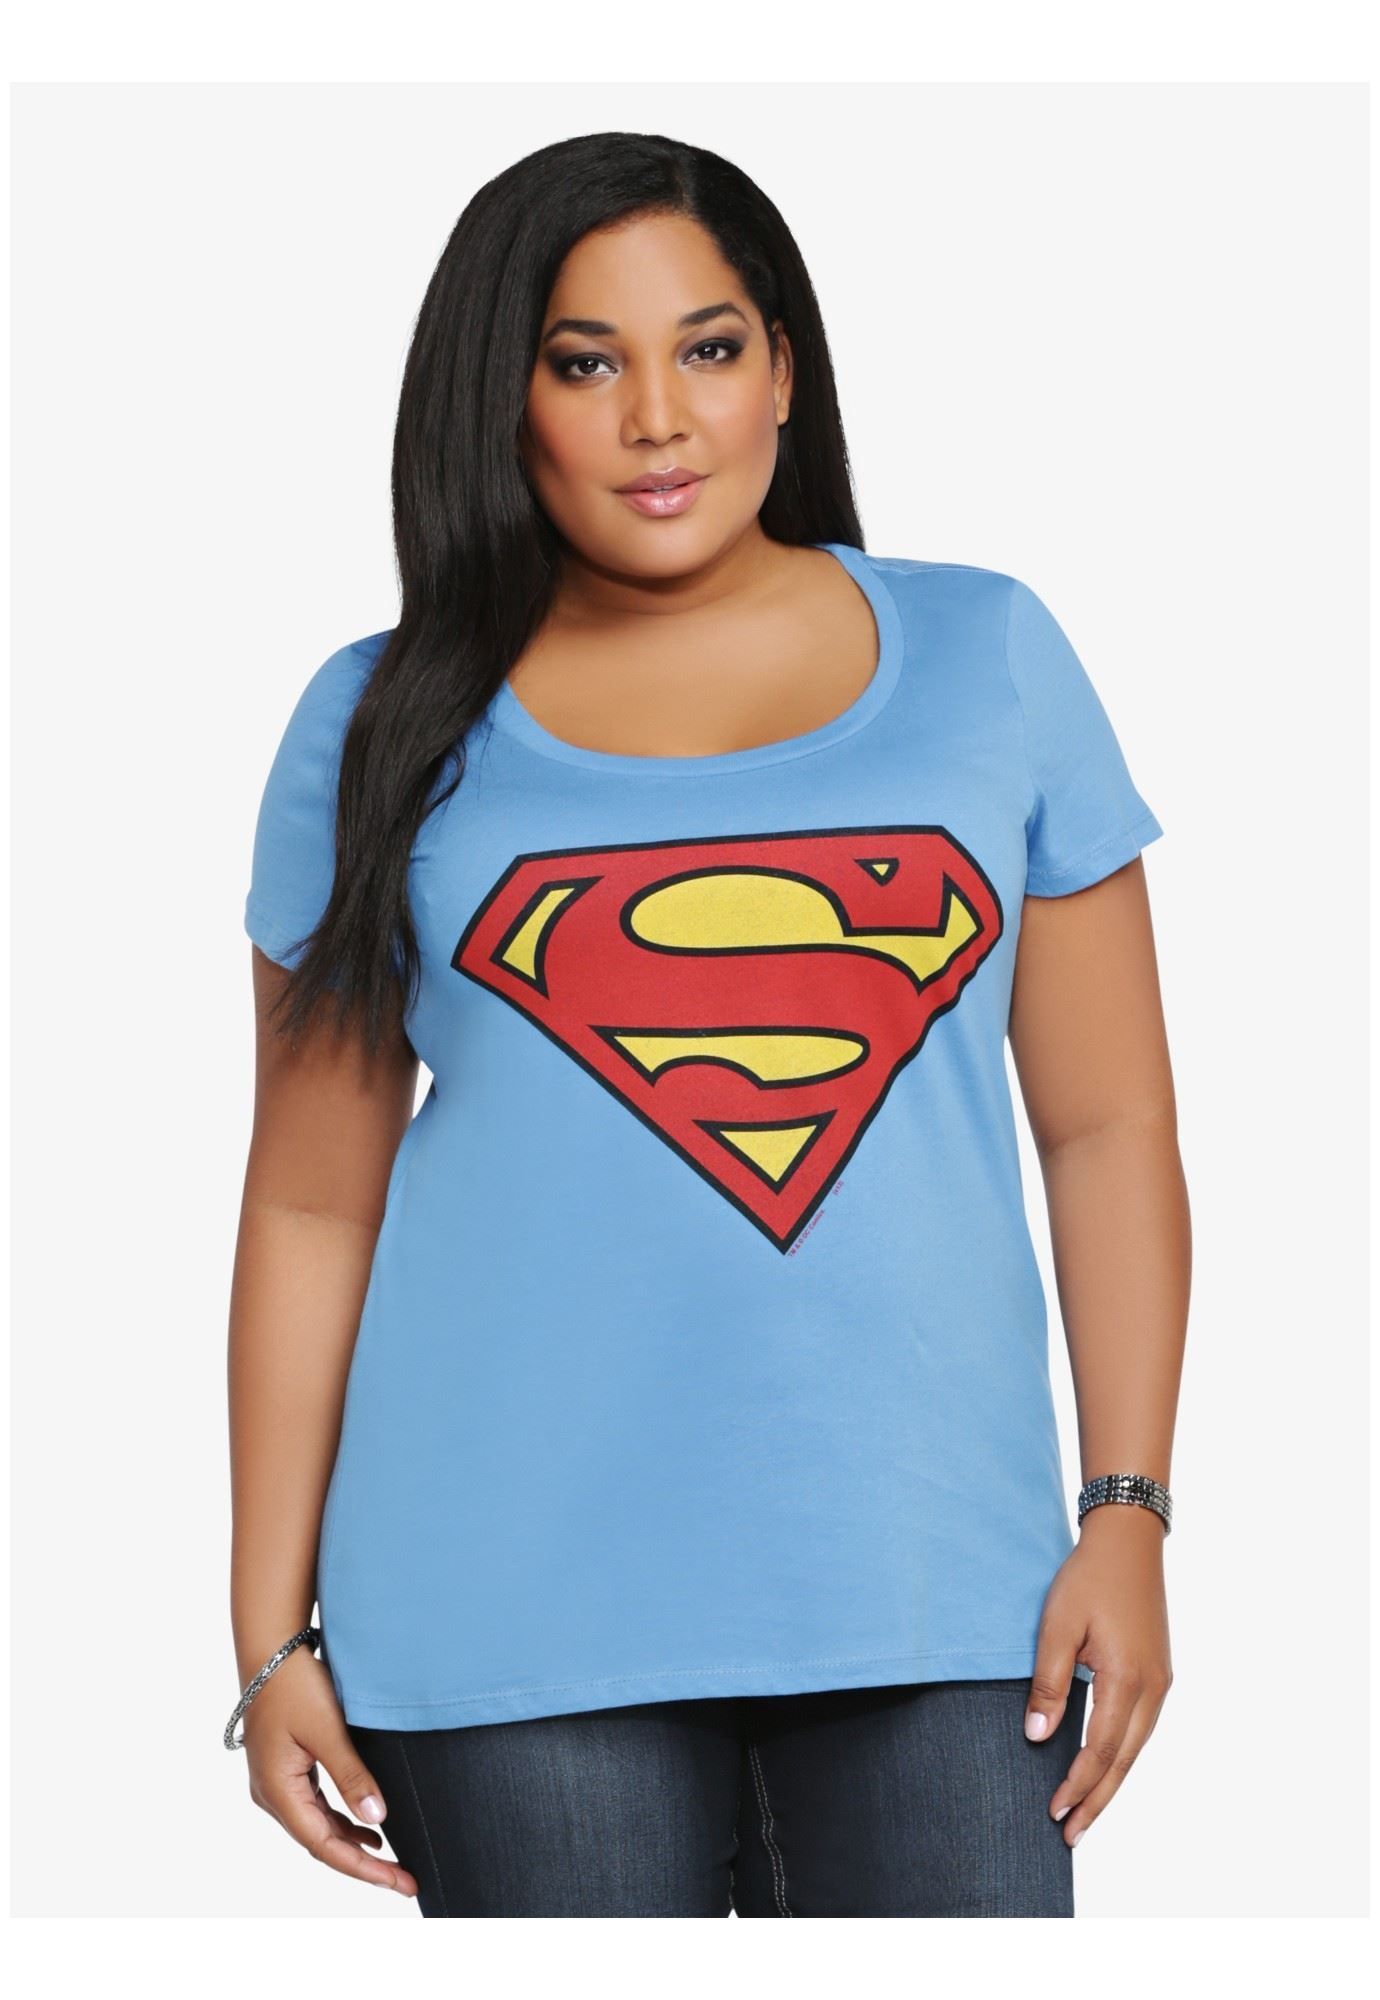 Plus Size Superman Graphic Tee